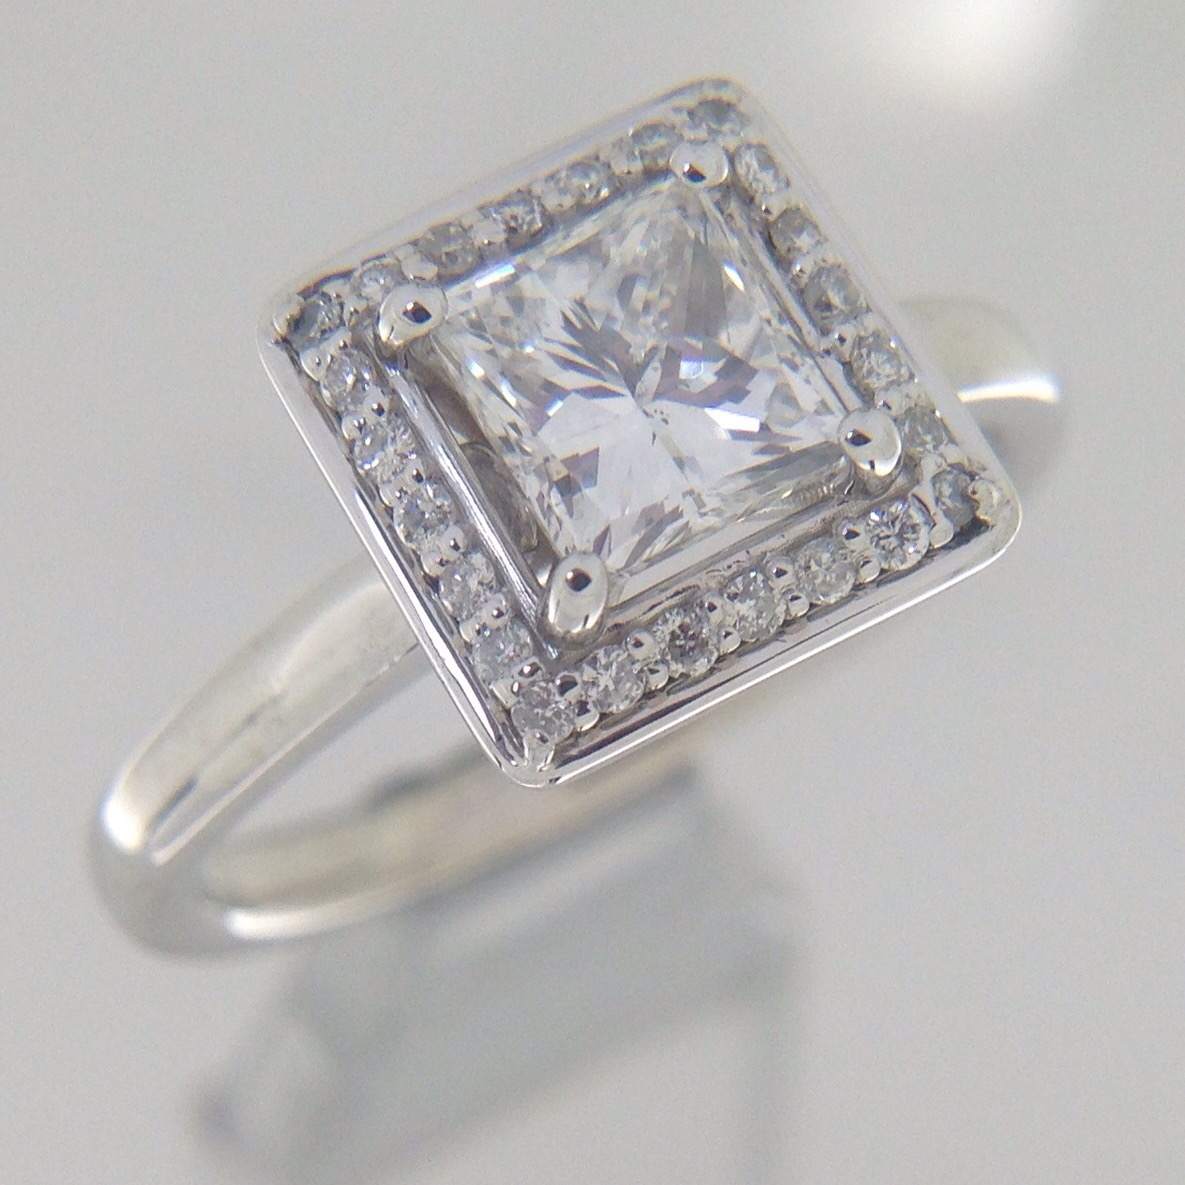 jewelry repair | Atlas Jewelers Bench Talk